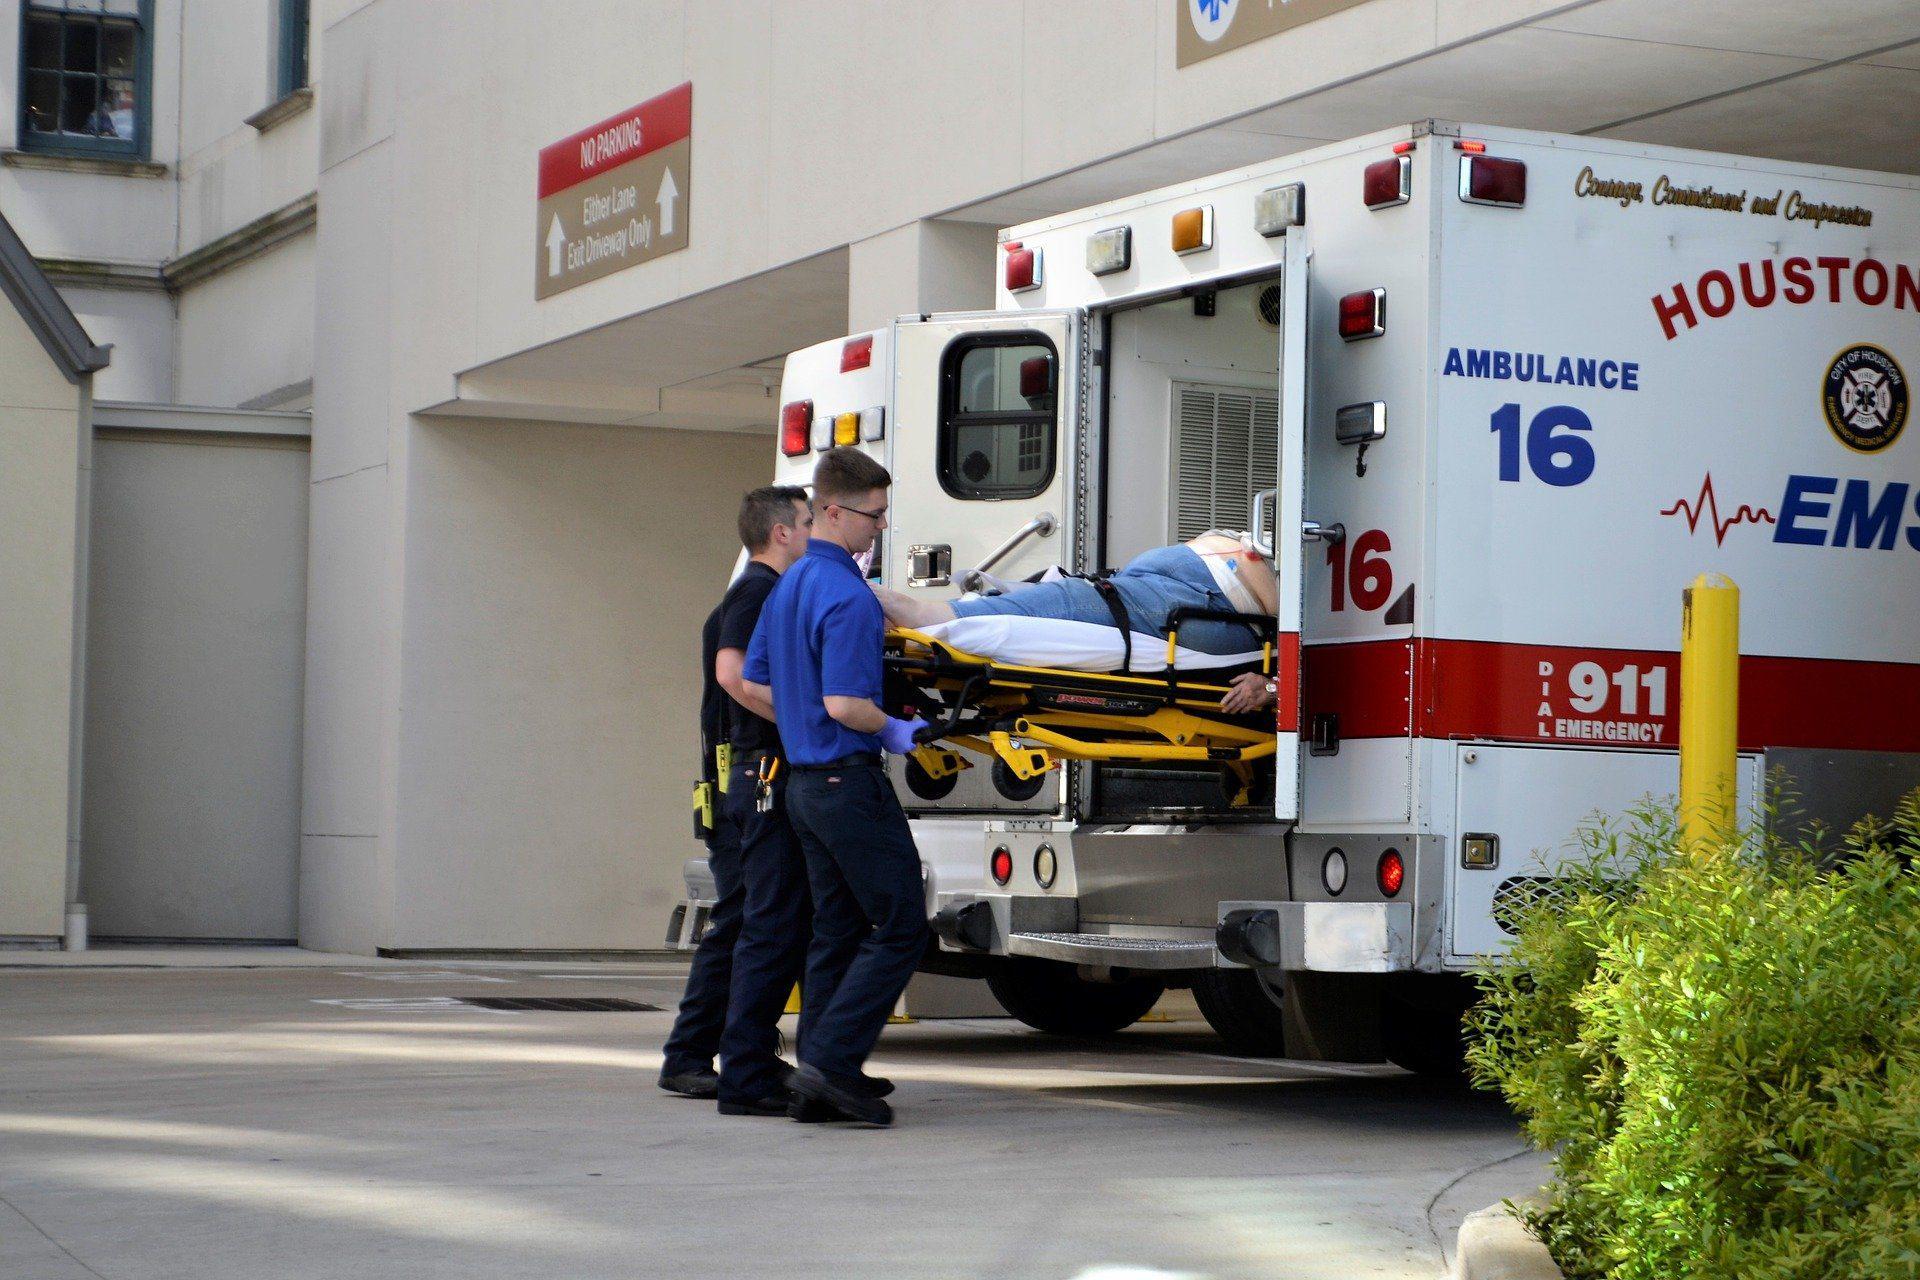 6 Tips to Improve Medical Communication as Paramedics